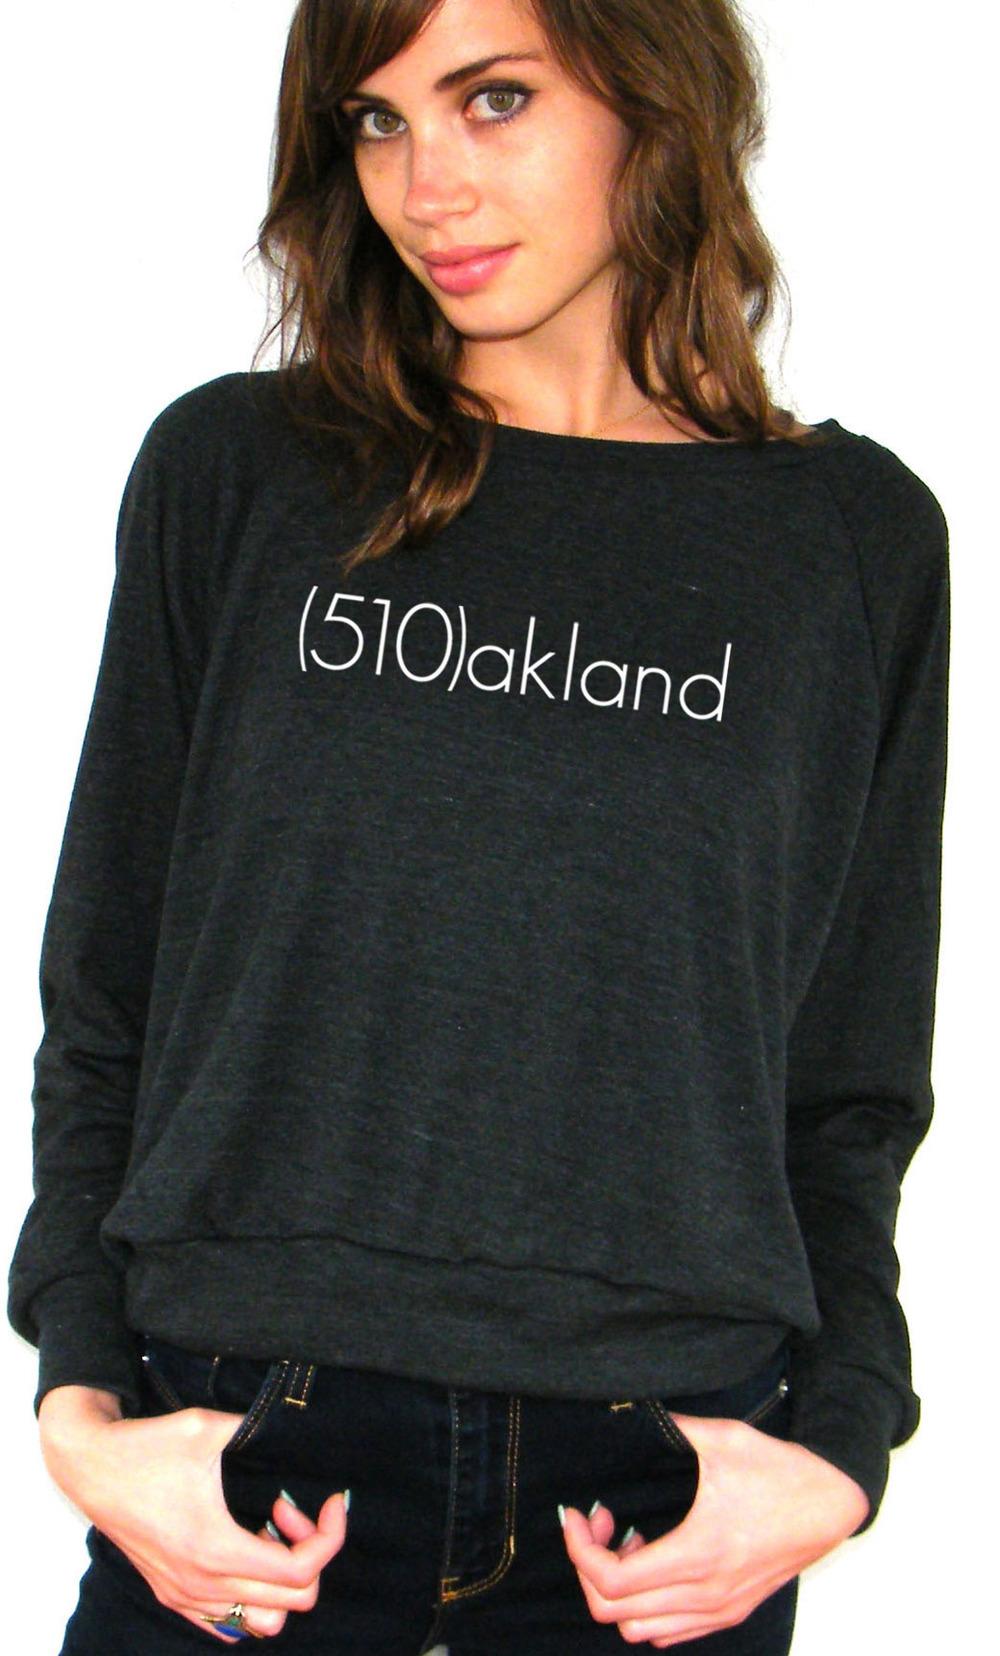 (510)akland